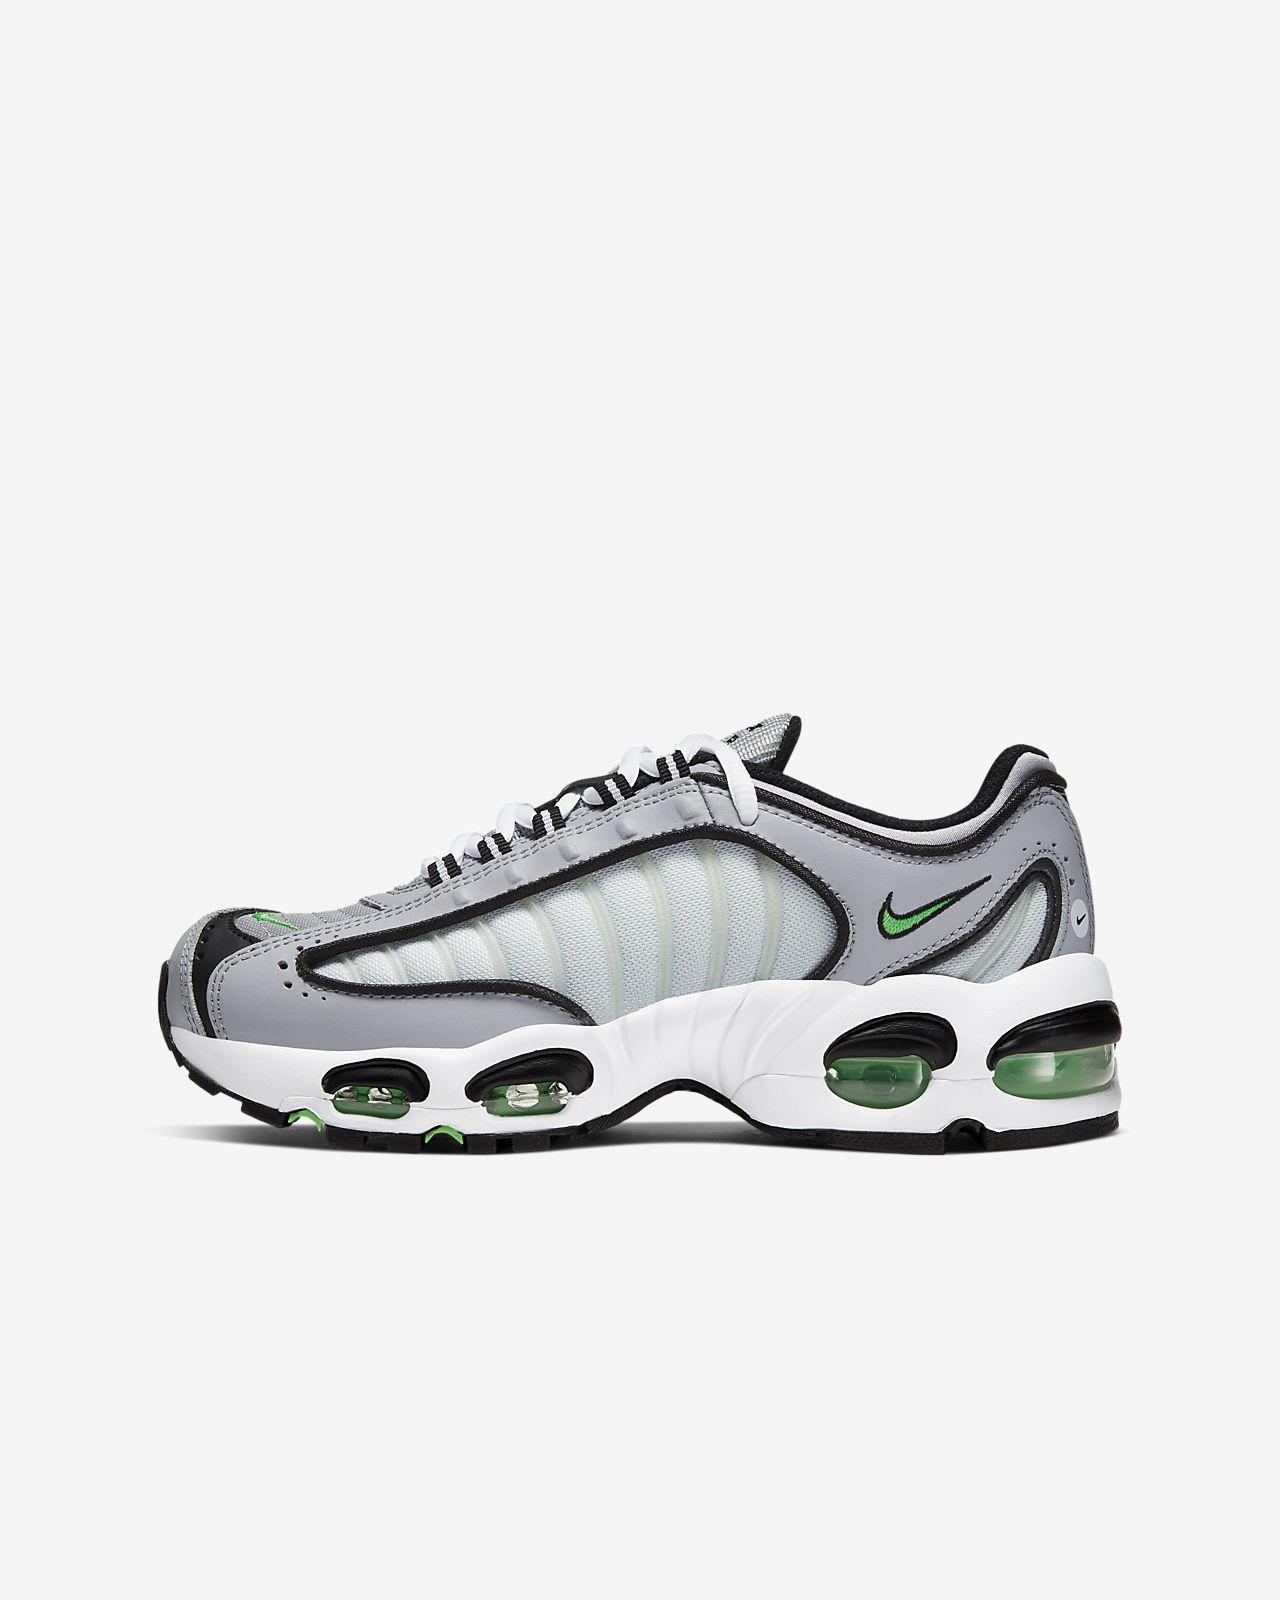 Nike Air Max Tailwind 4 SE Schuh für ältere Kinder